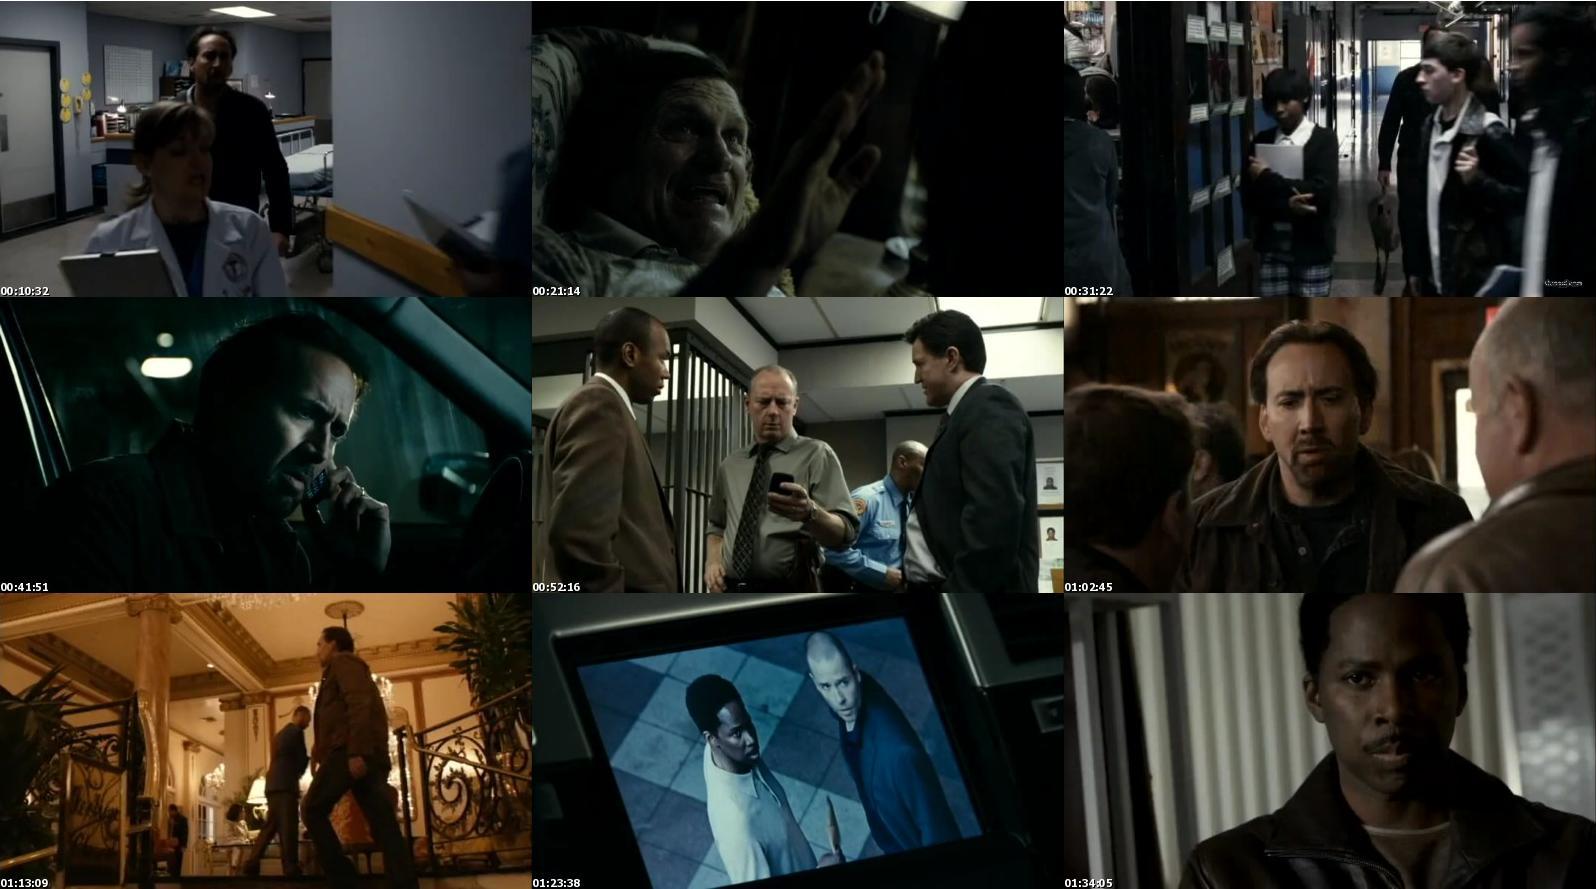 http://2.bp.blogspot.com/-KOiDrC8UJXY/TxqfGk_lD3I/AAAAAAAABlM/ToZkDG1iQx0/s1600/Seeking+Justice+%25282011%2529+R3+DVDRip+Screen.jpg